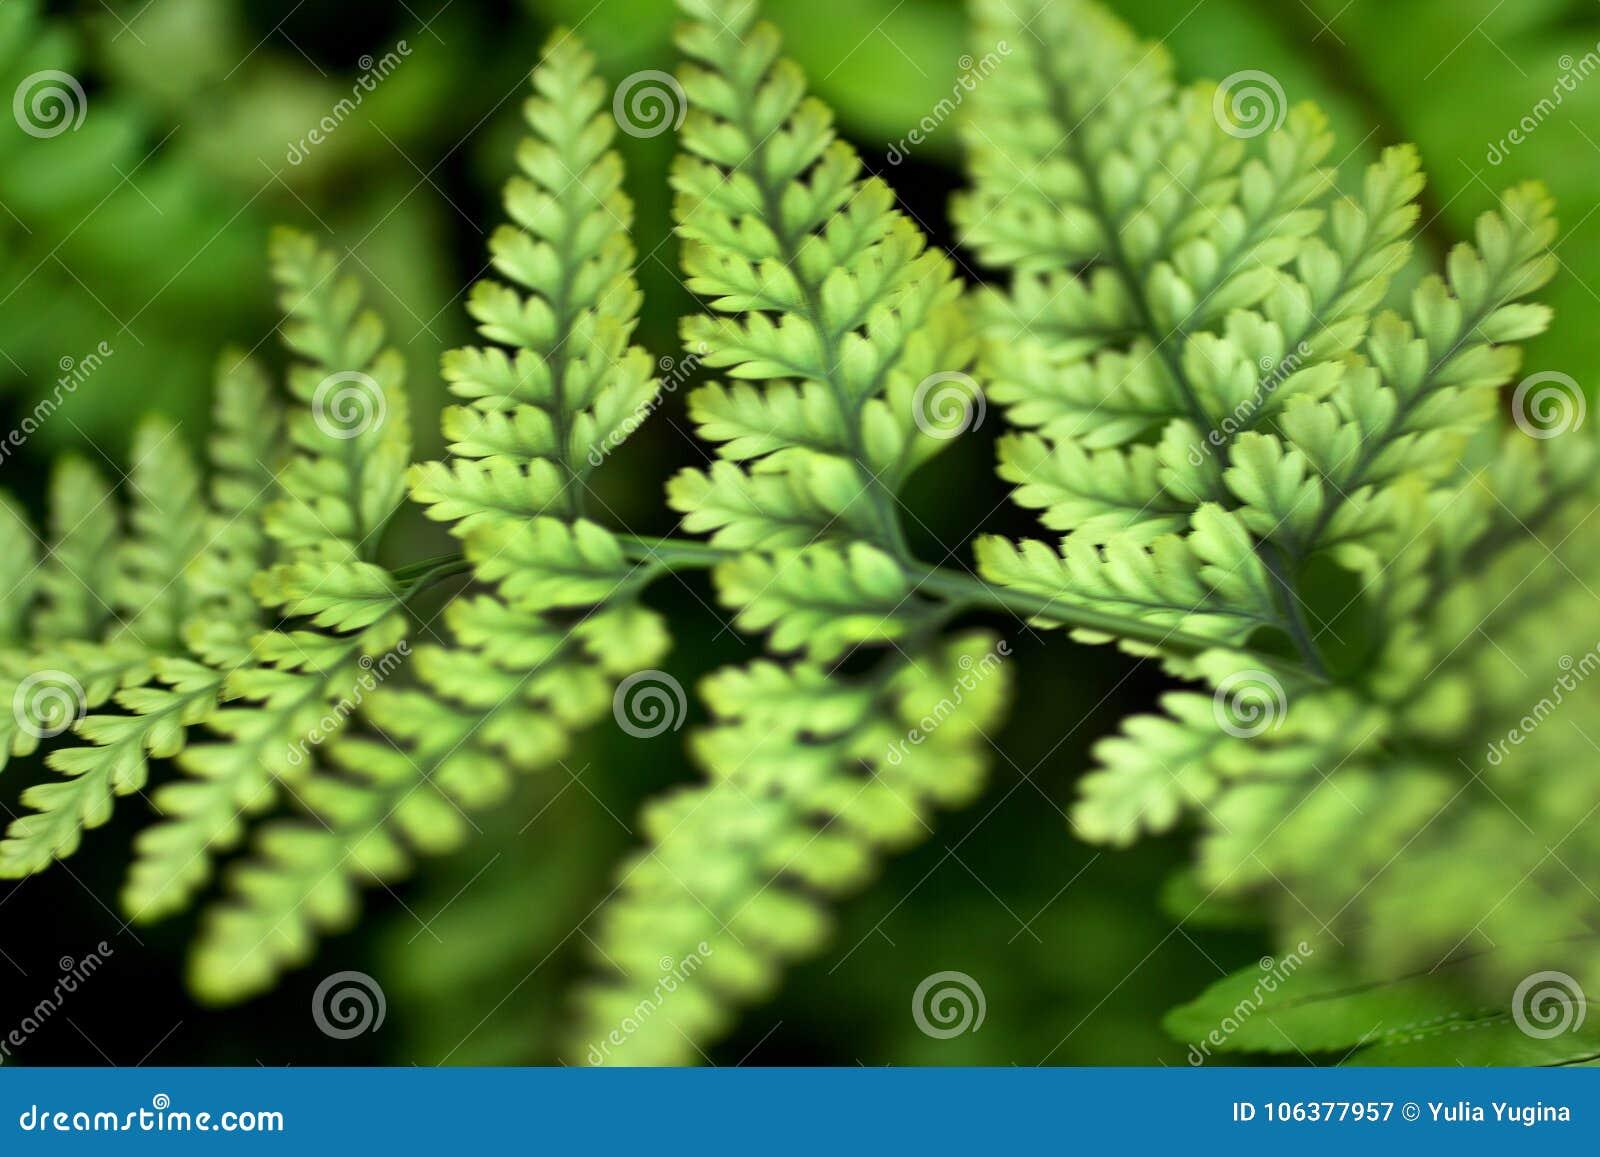 Fern leaf close-up on herbal bright background.